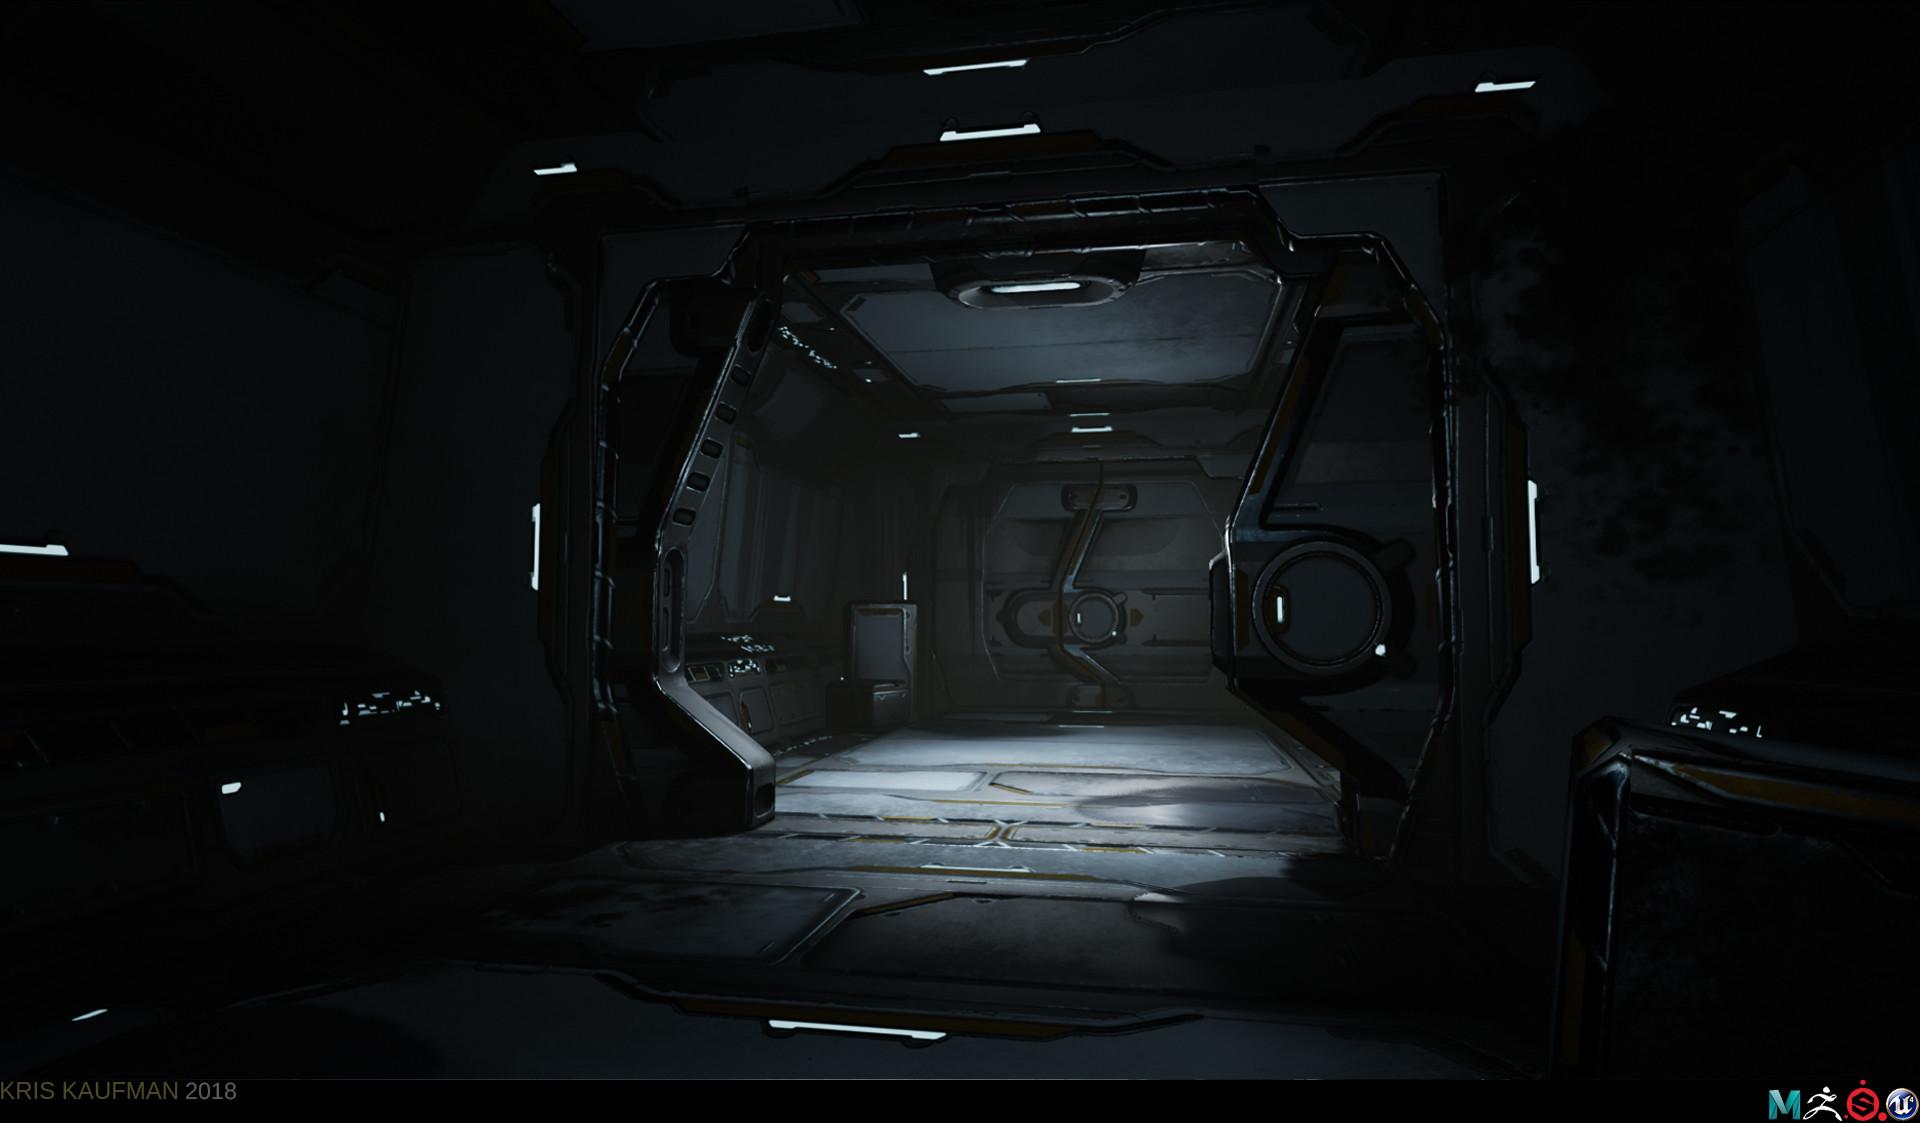 Kris kaufman corridor 03